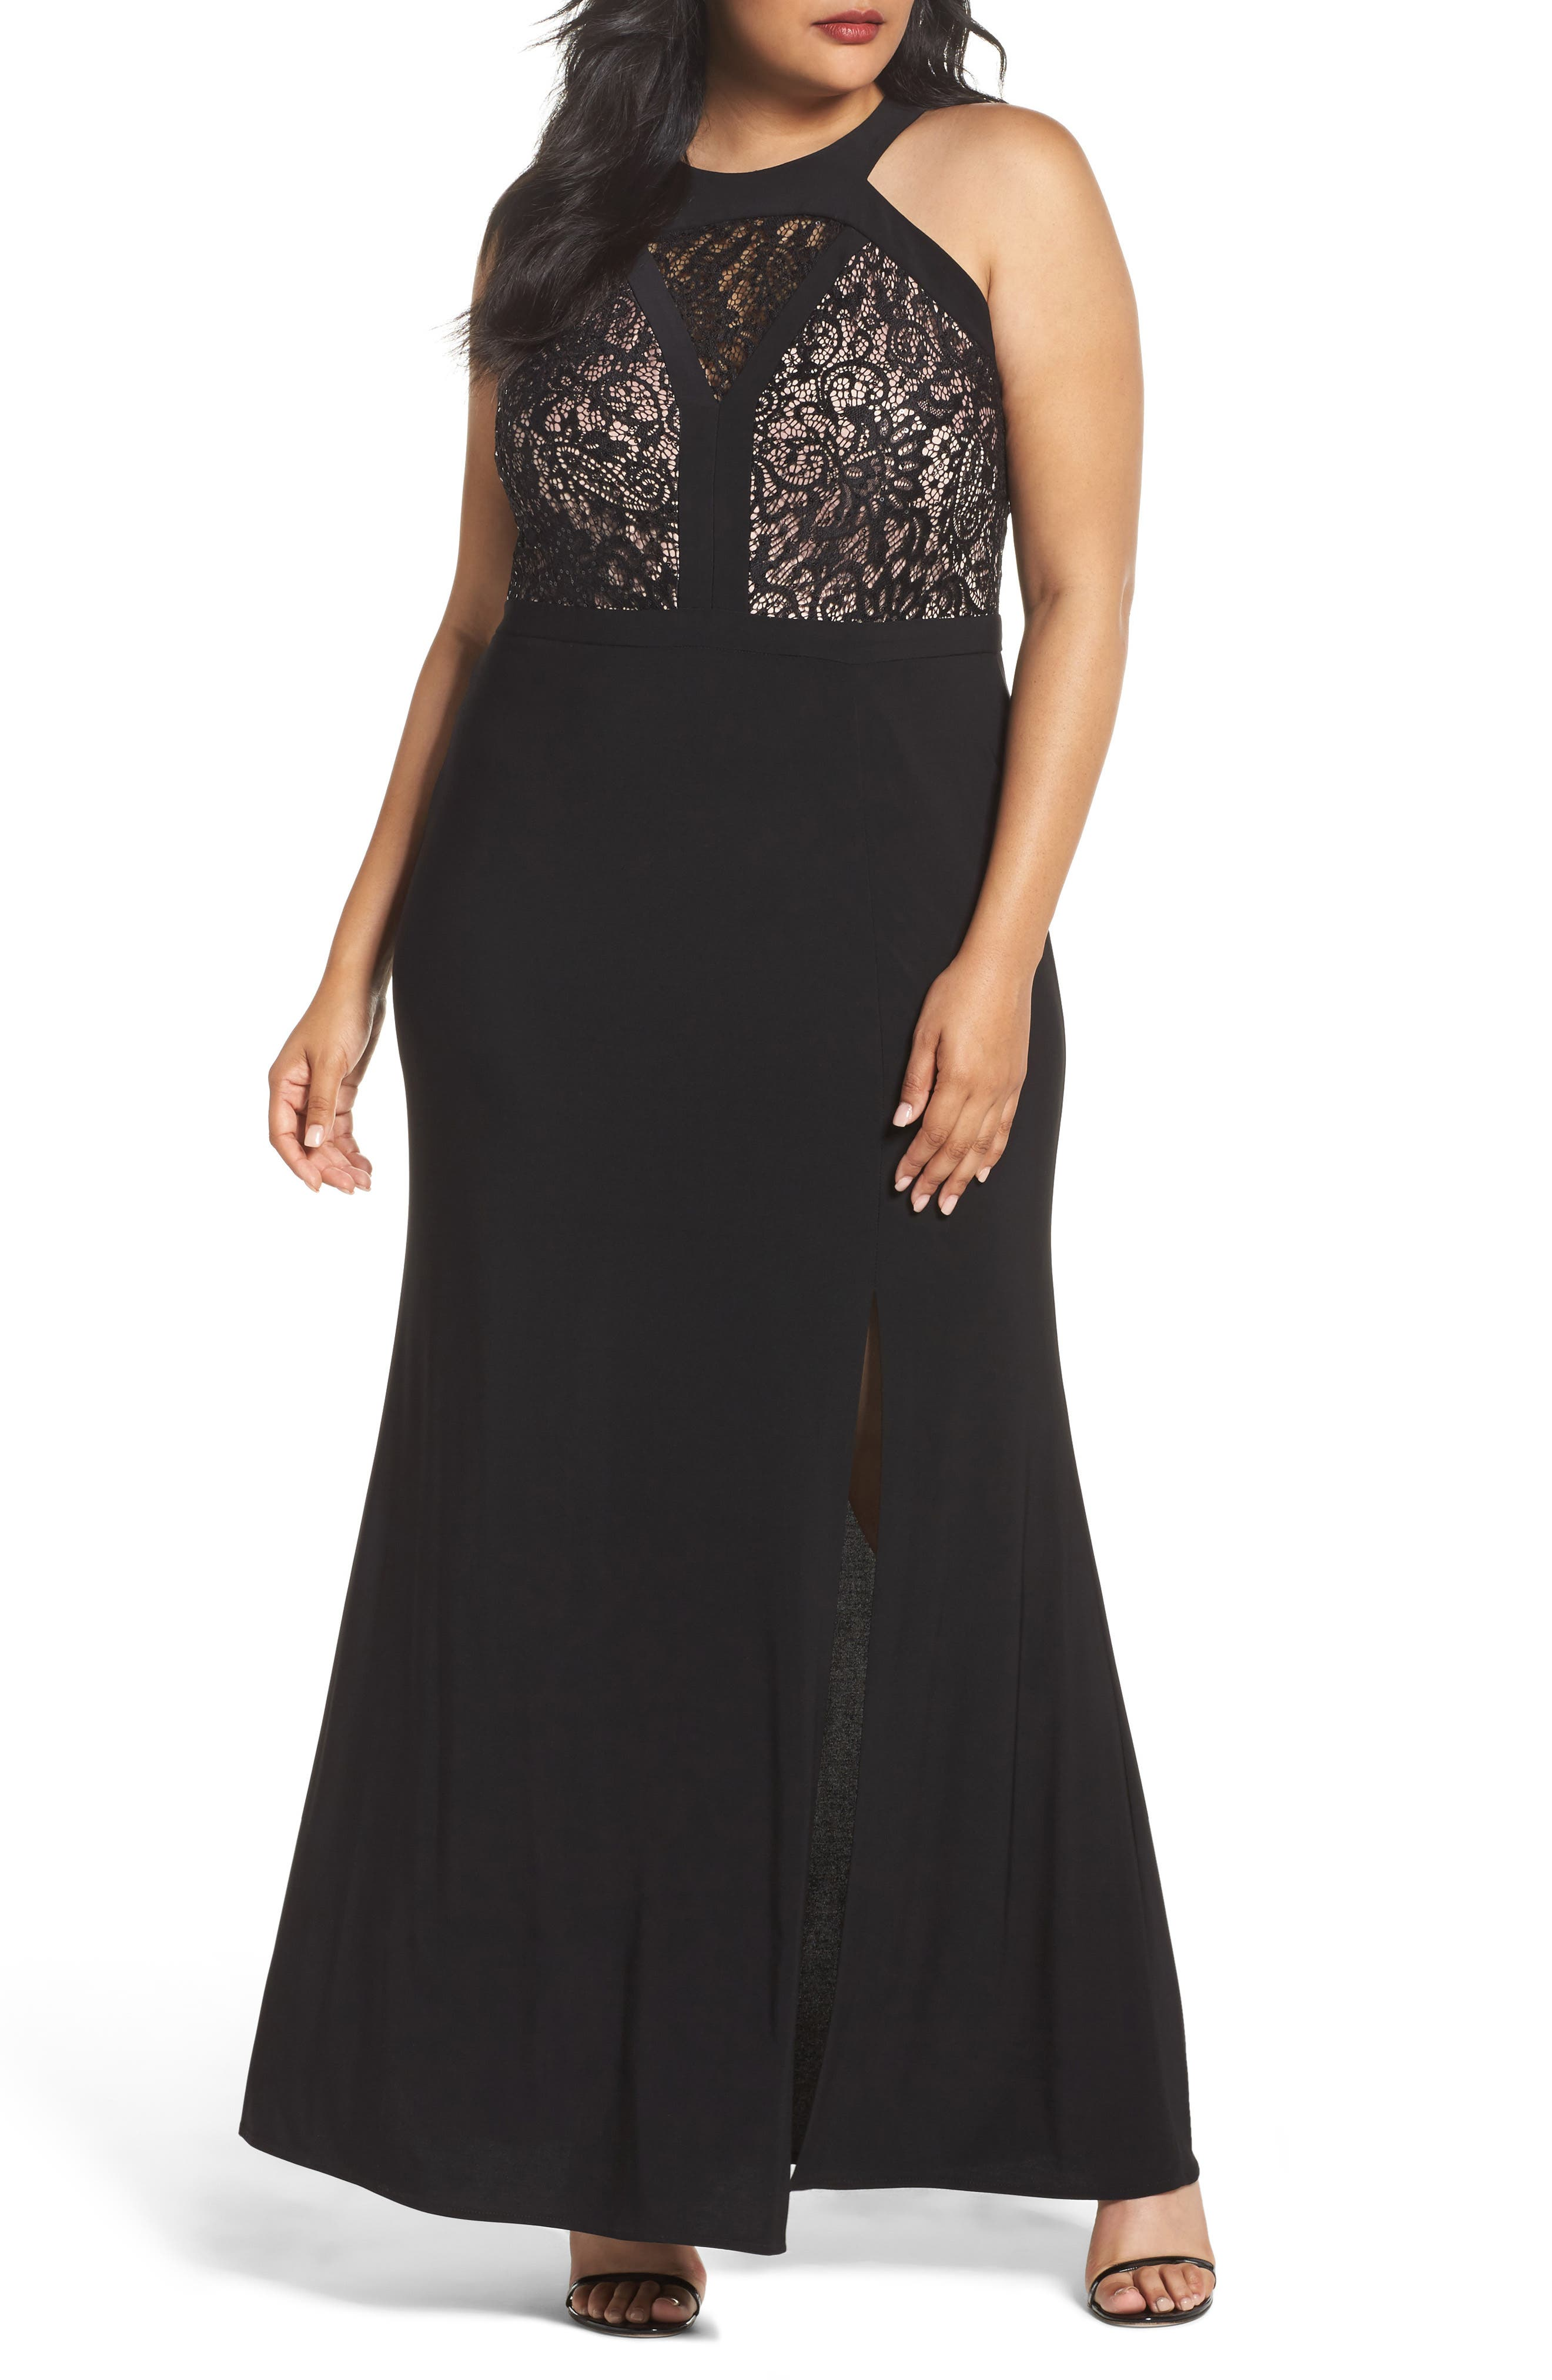 MORGAN & CO.,                             Lace Bodice Dress,                             Main thumbnail 1, color,                             BLACK/ NUDE